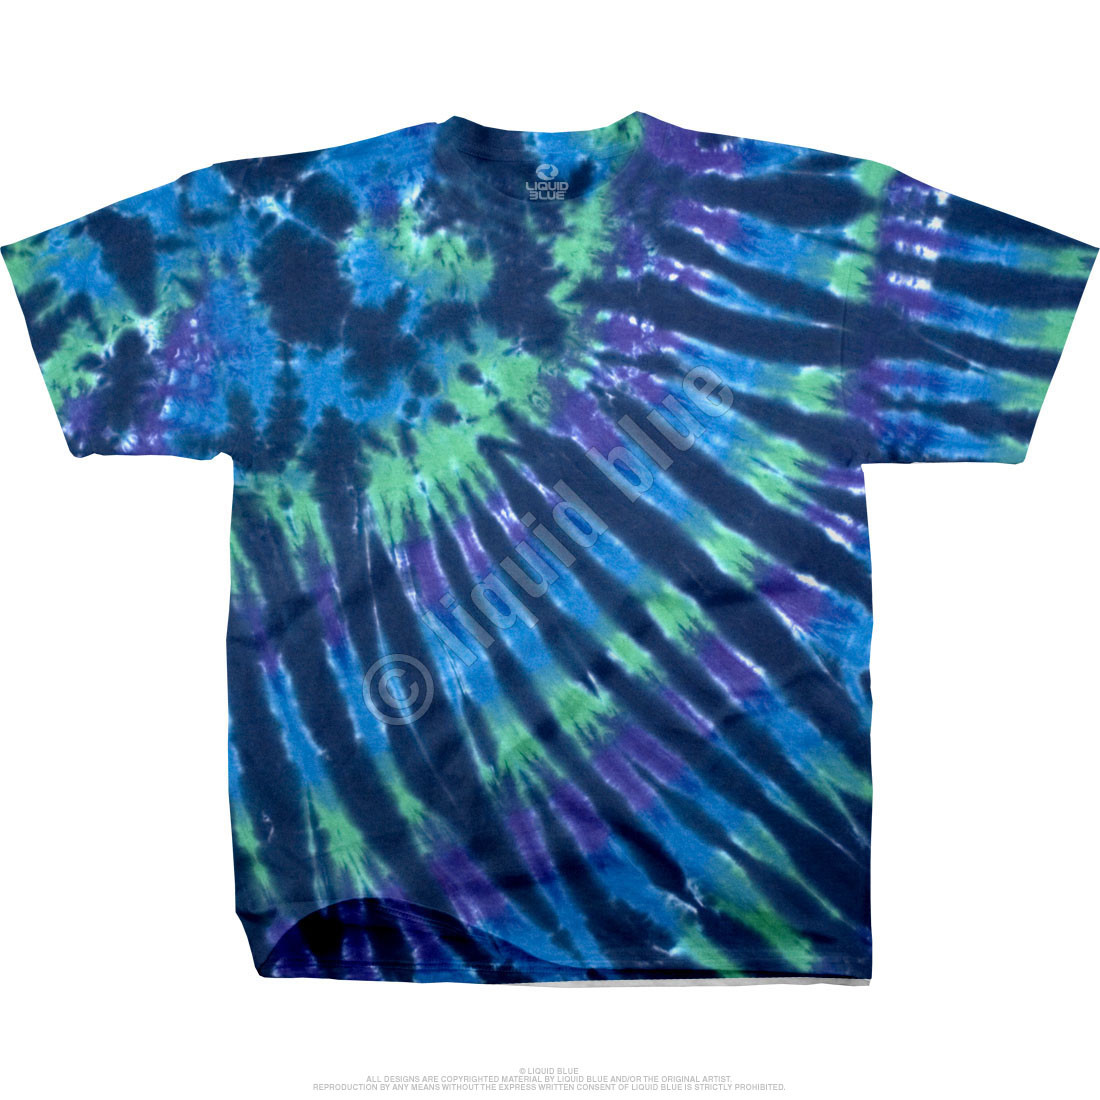 Cool Nebula Unprinted Tie-Dye T-Shirt